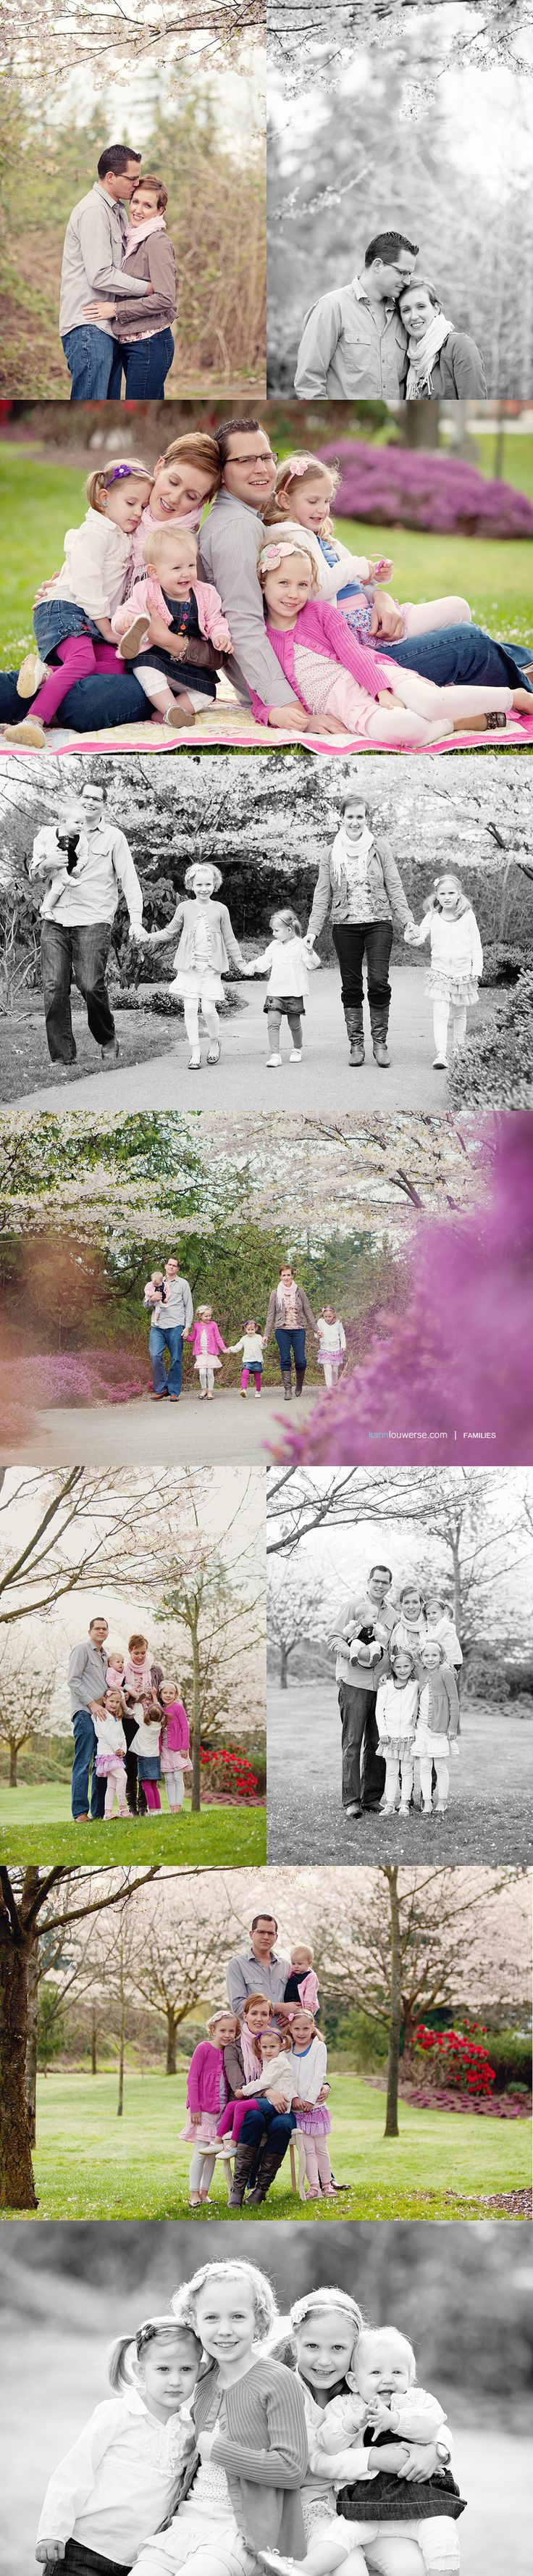 Family Portrait Idea~  Love the pop of pink